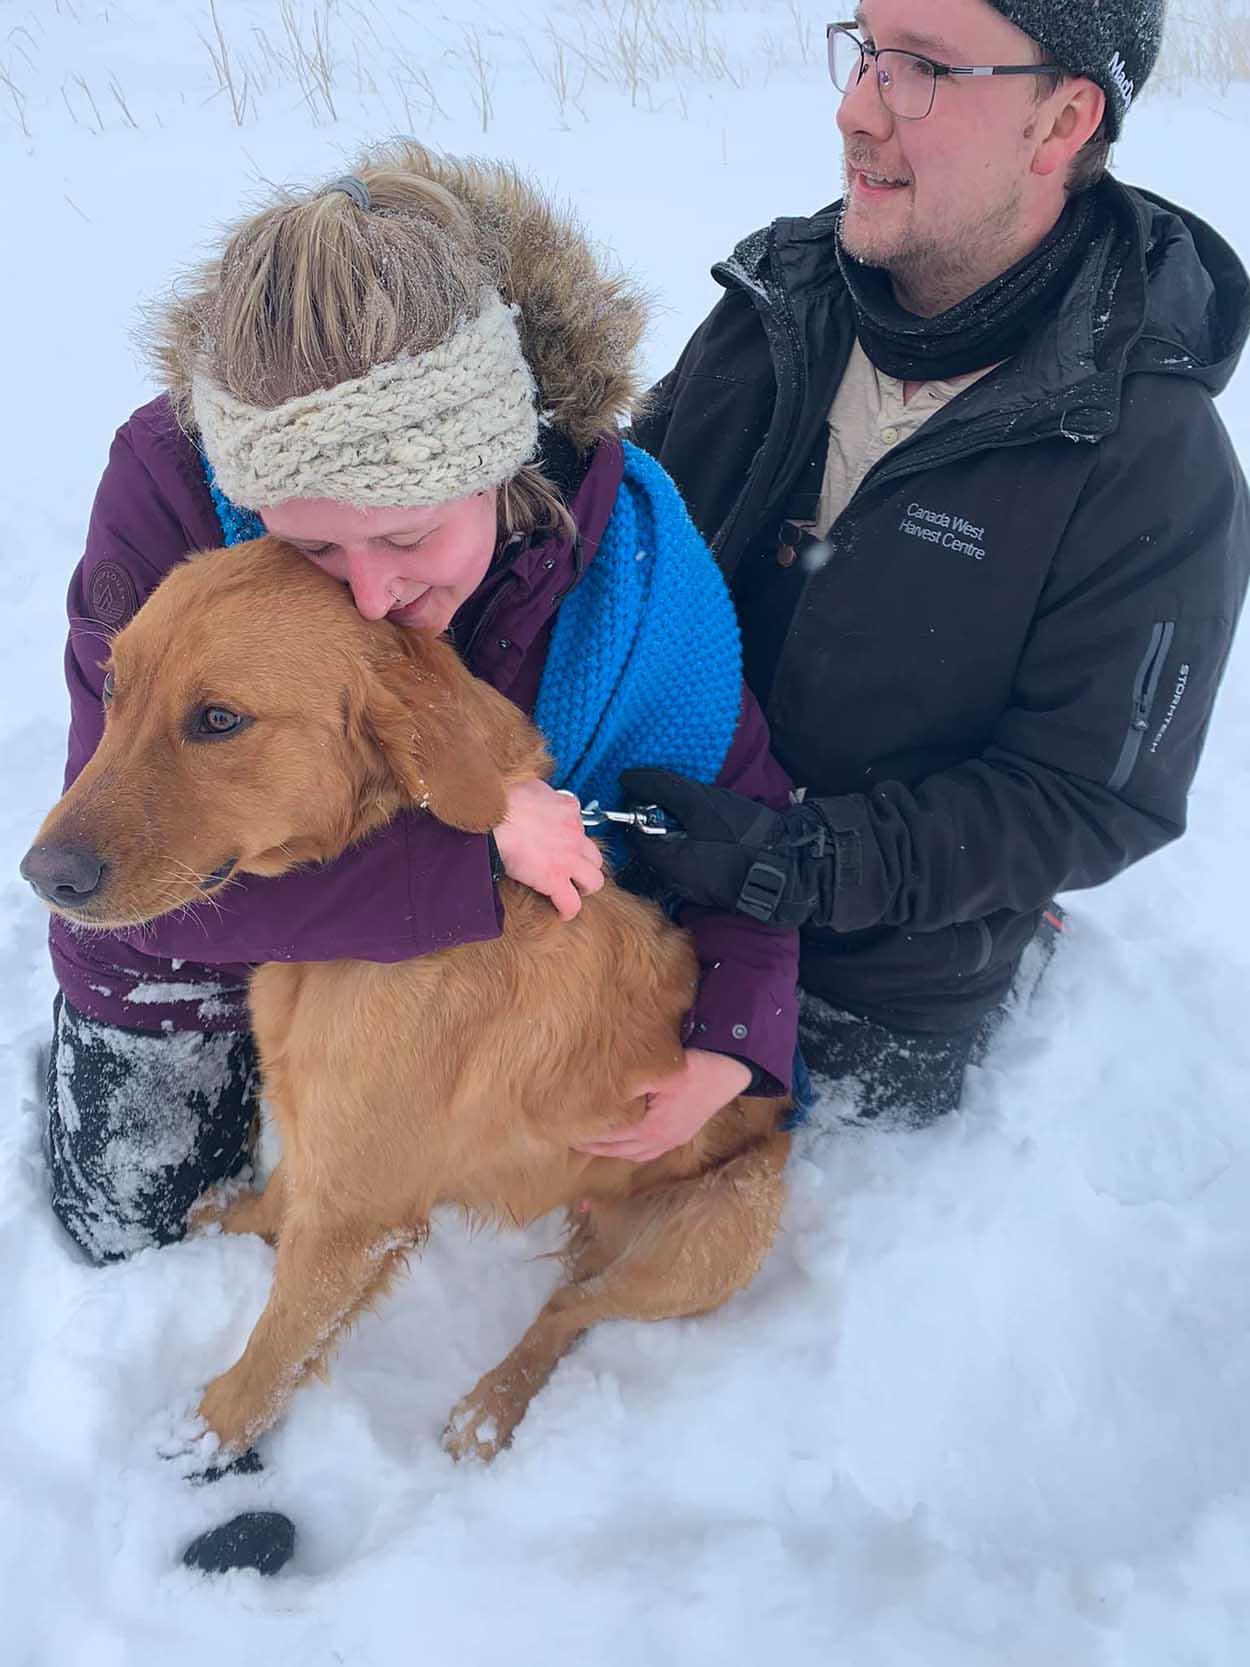 Familia encuentra a su mascota en la nieve